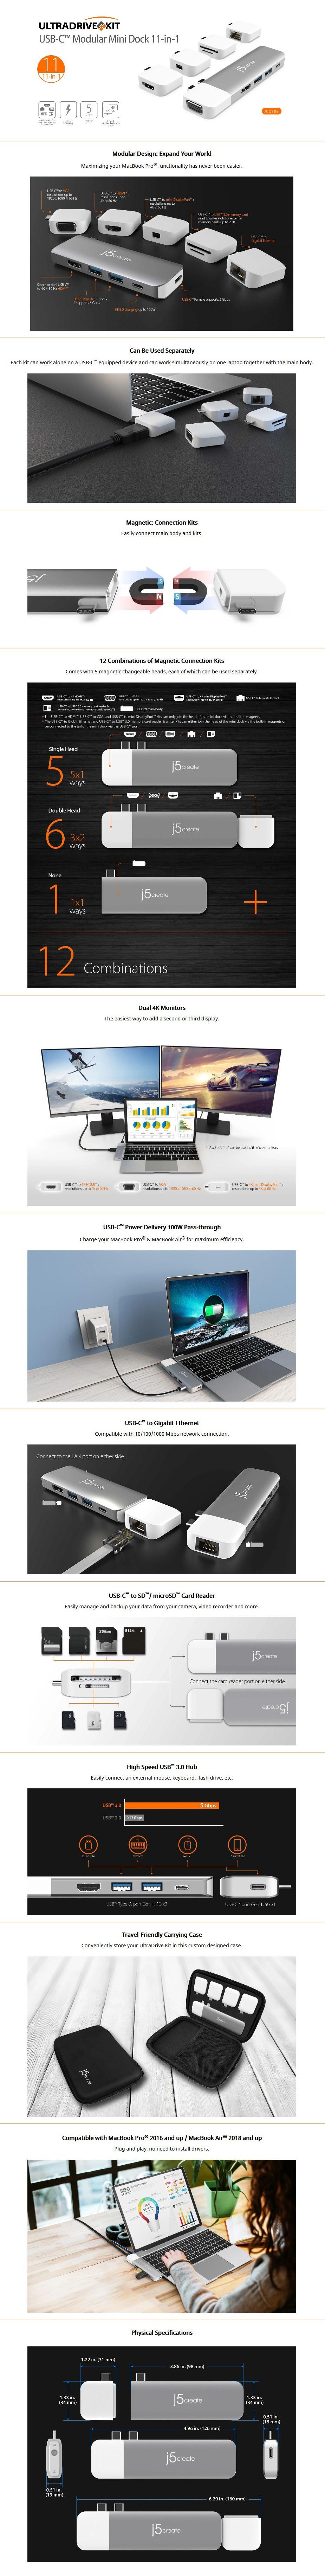 j5create JCD389 ULTRADRIVE Kit Modular Multi-Display USB-C Dock - Overview 1